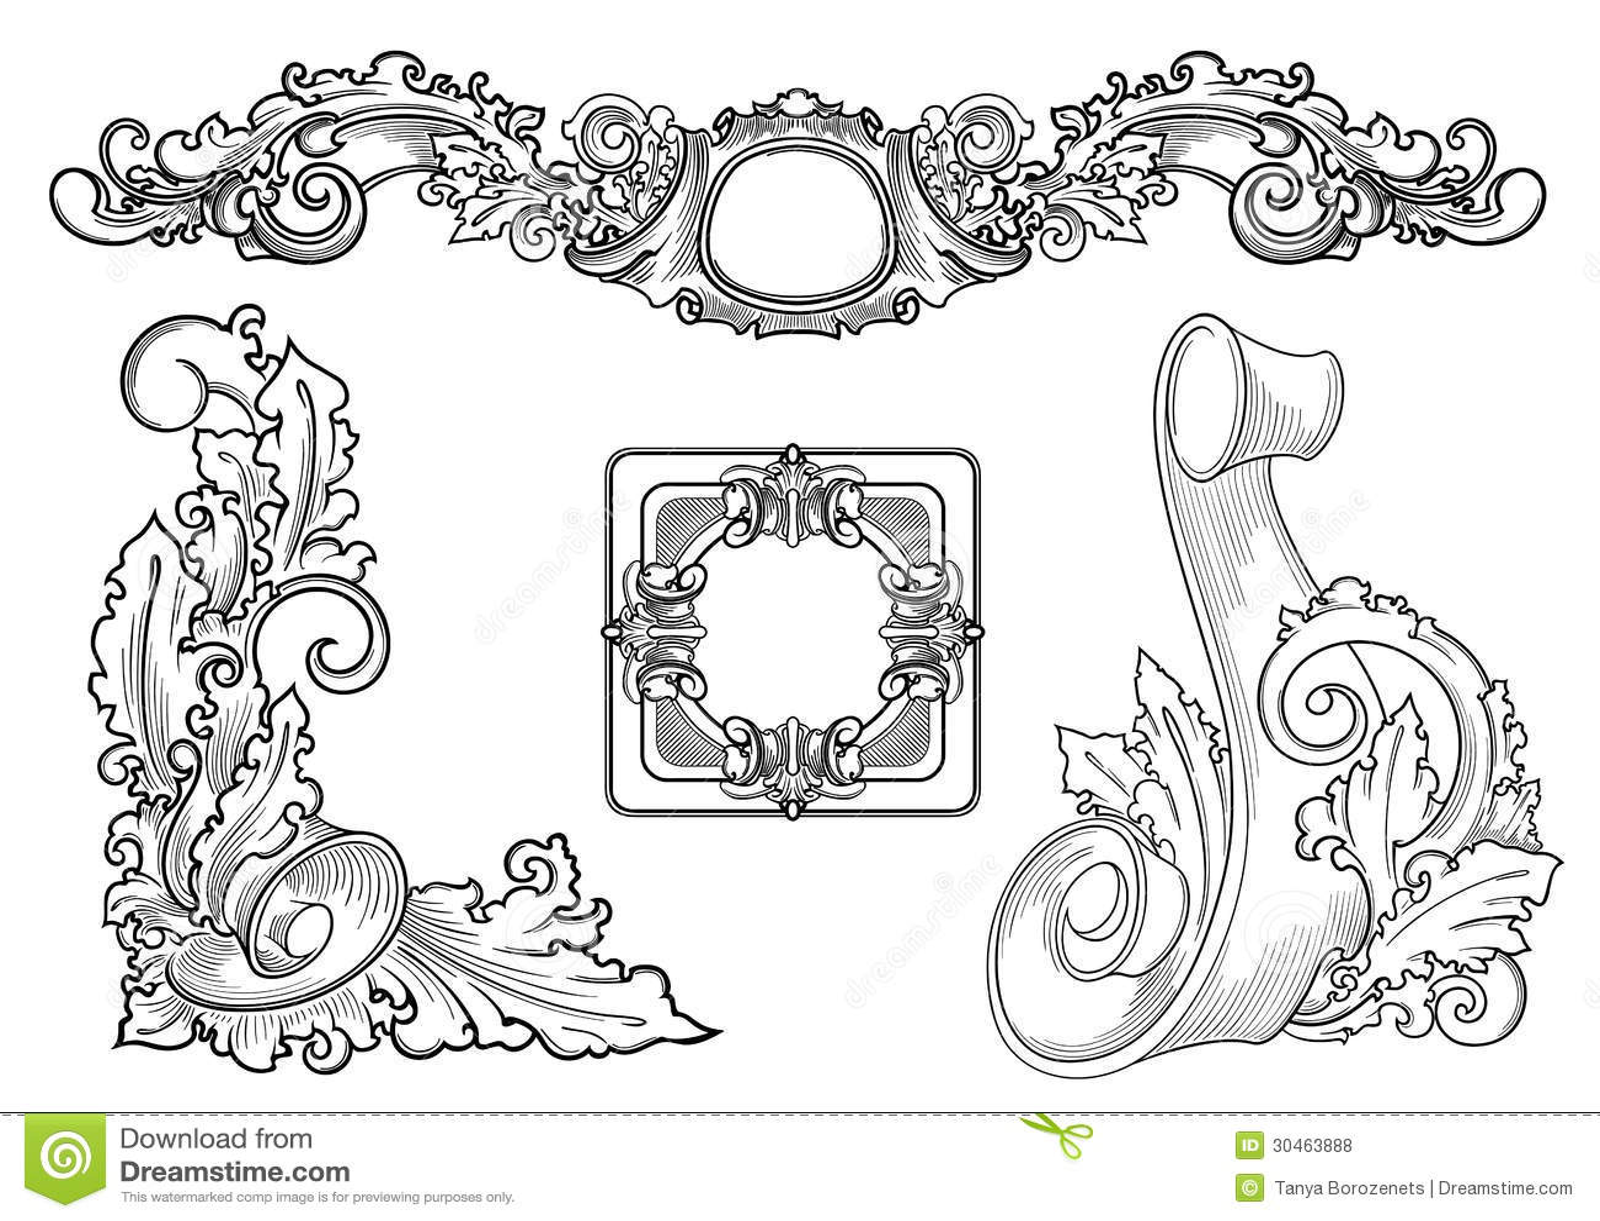 free graphic design elements